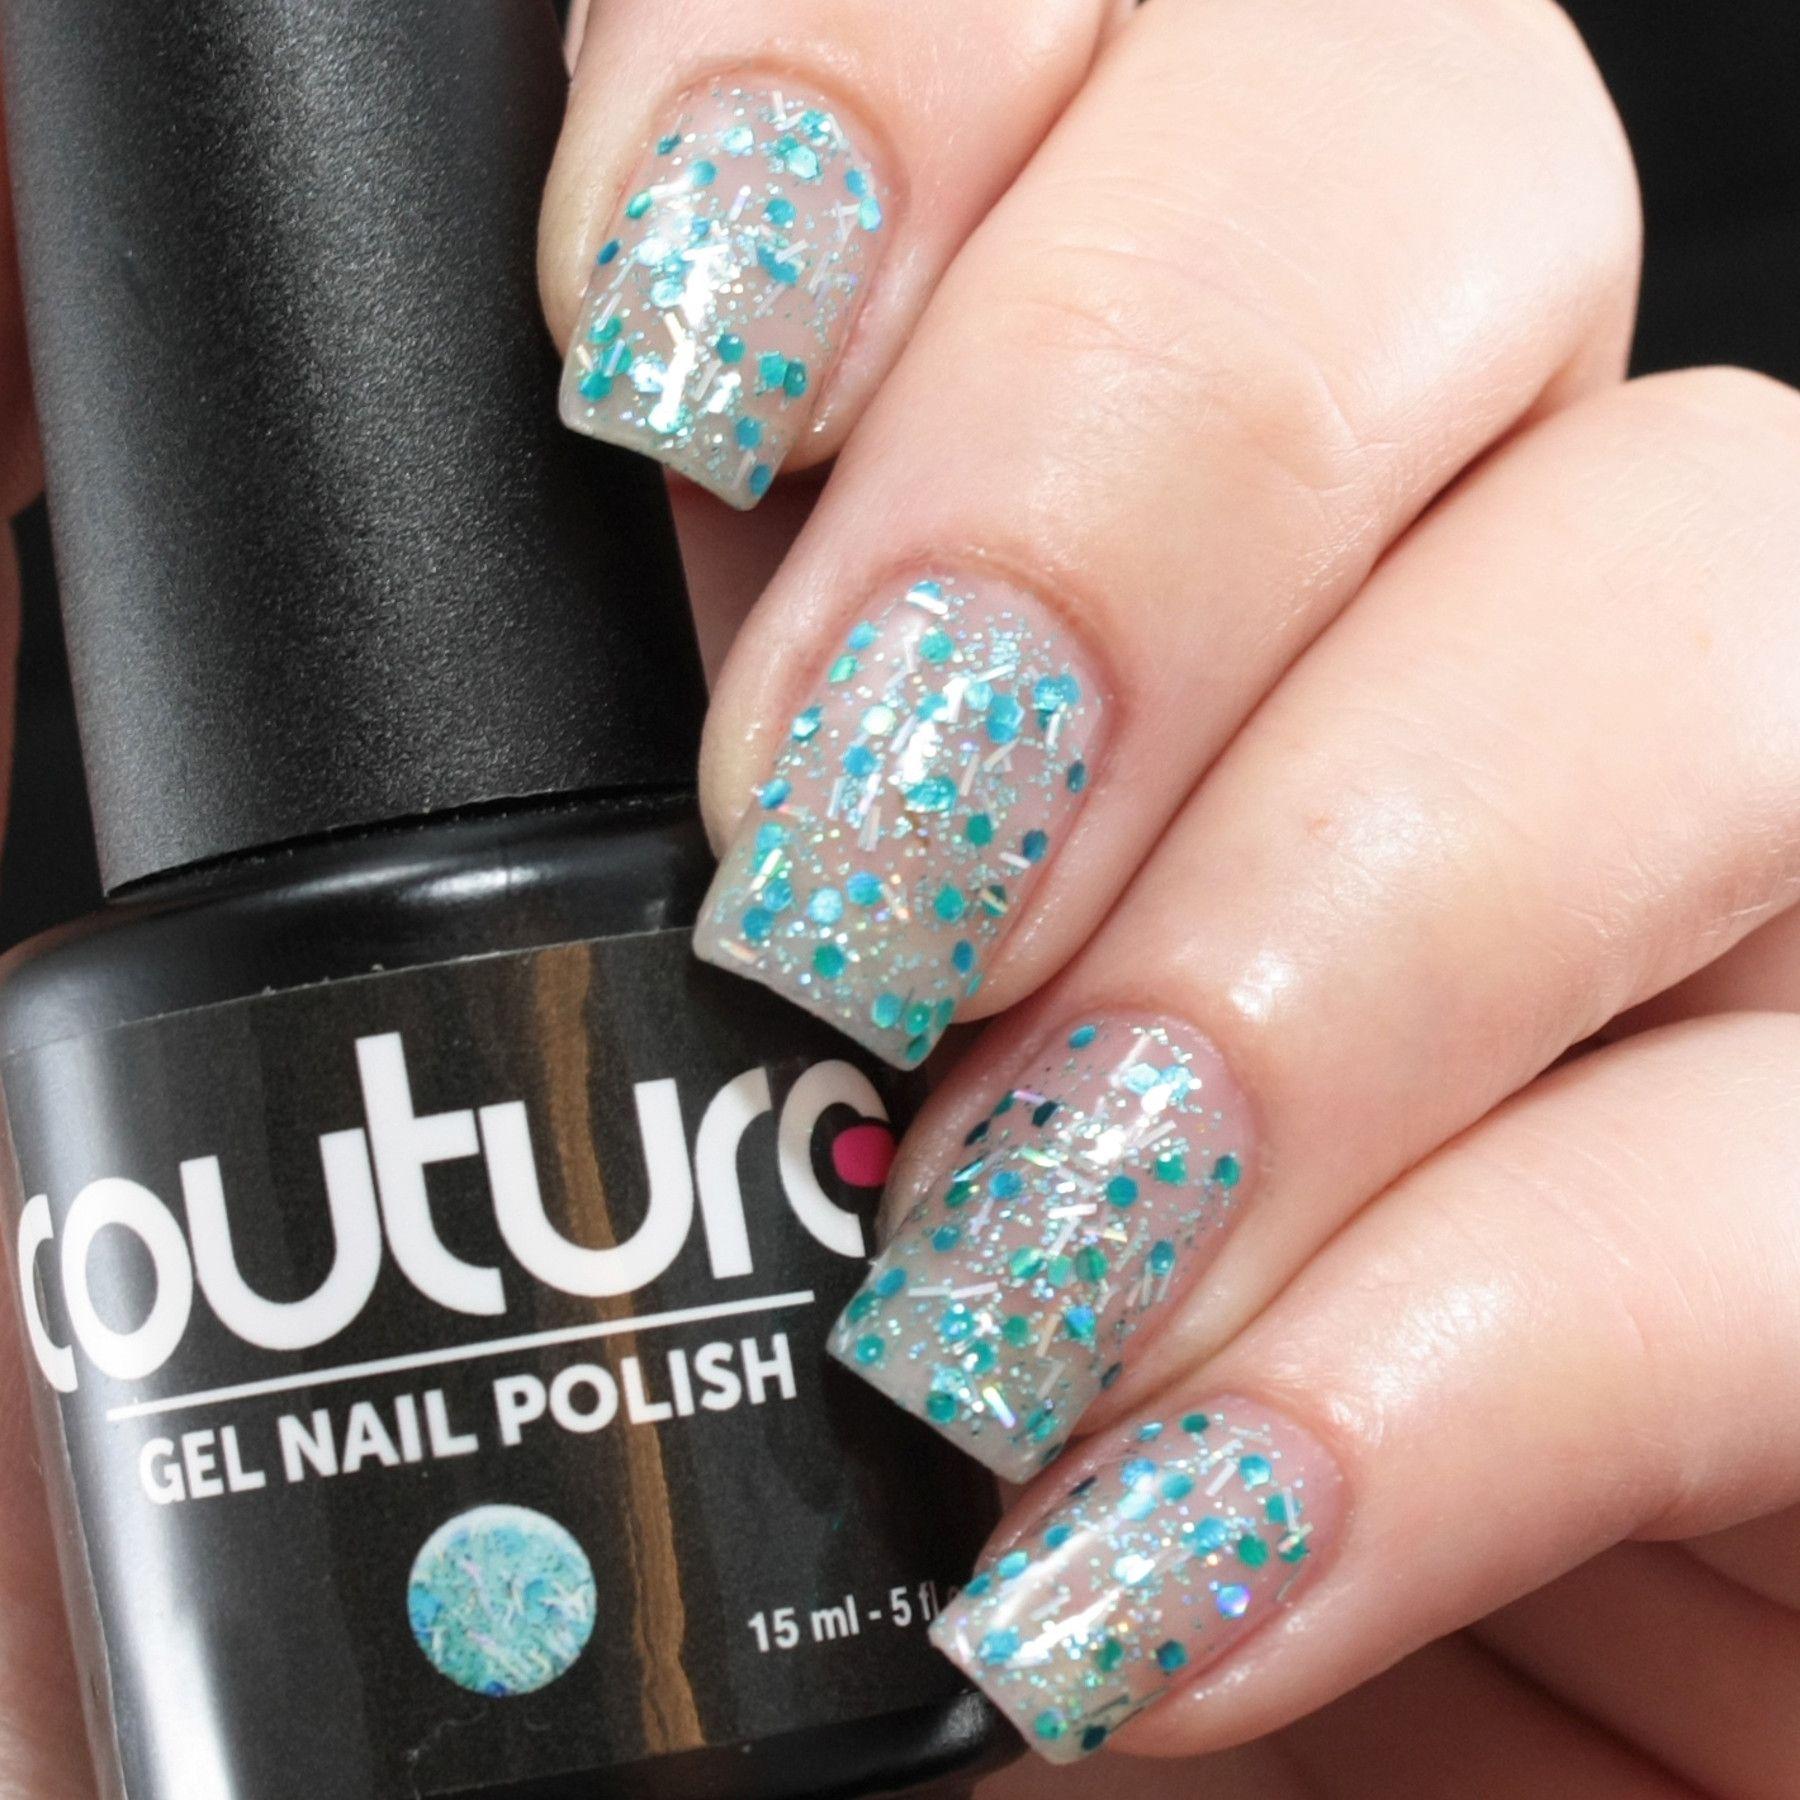 Drama Queen 31 By Couture Gel Nail Polish Nail Designs